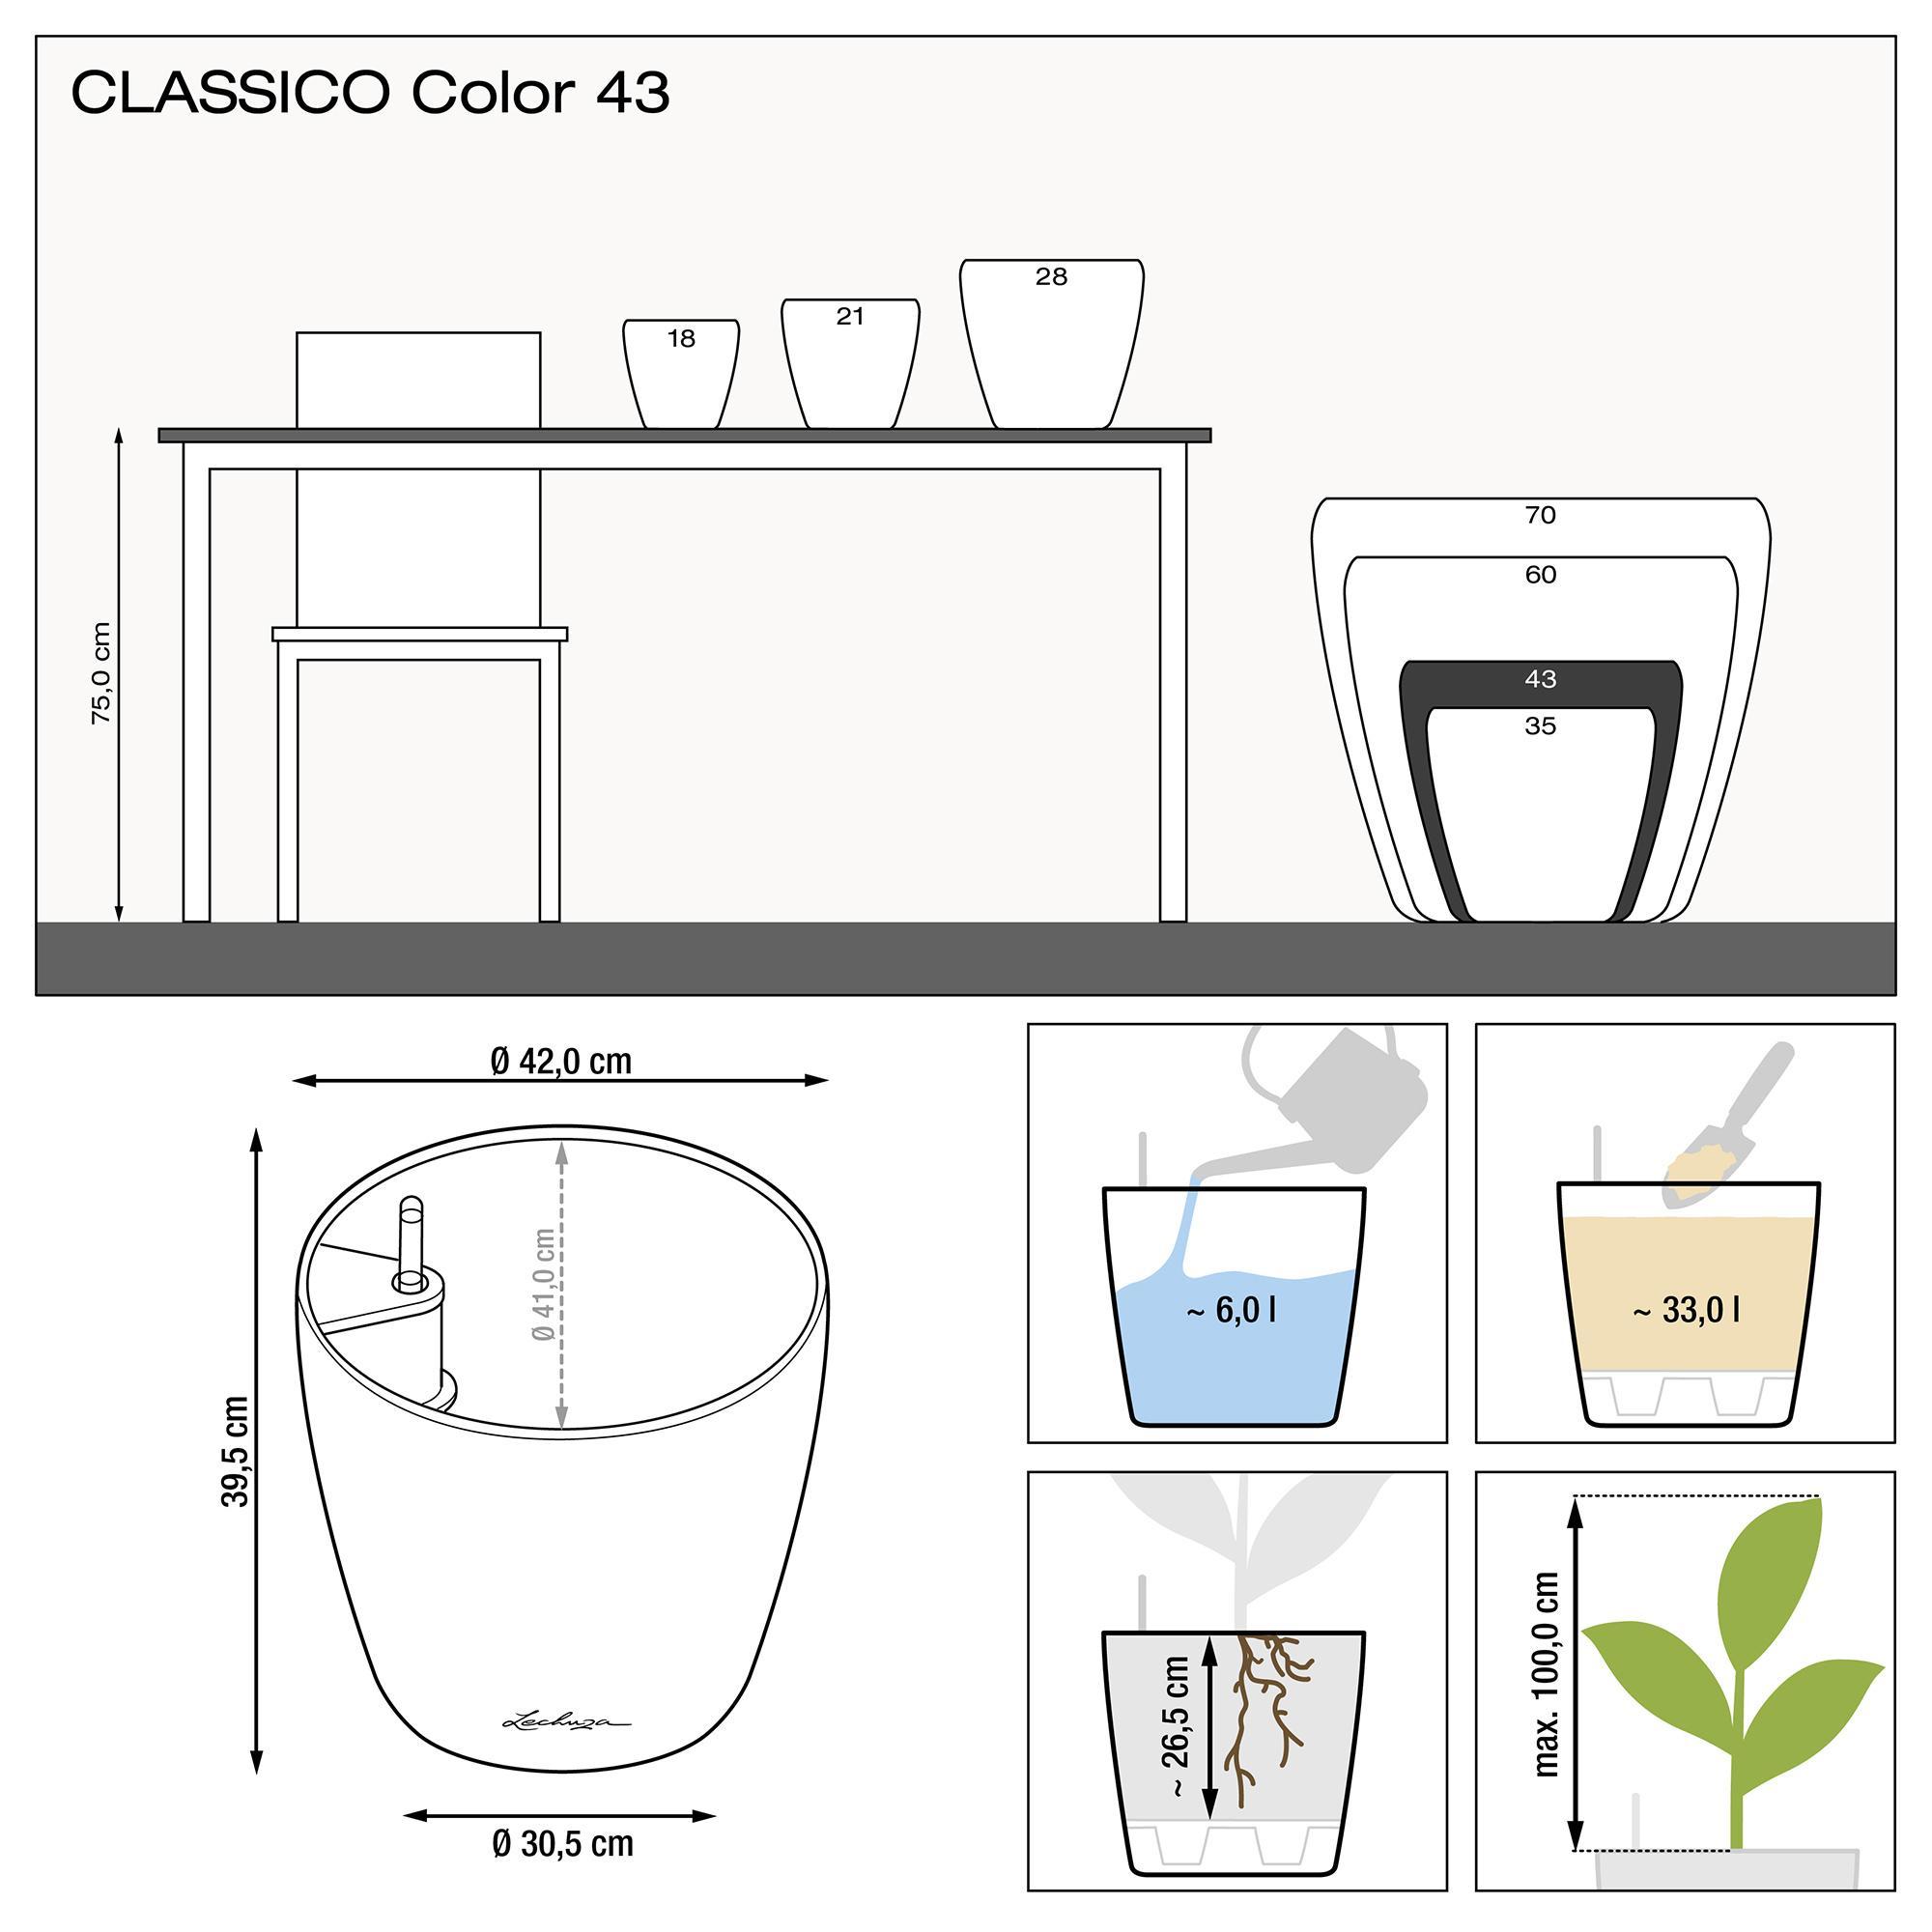 CLASSICO Color 43 gris pizarra - Imagen 2